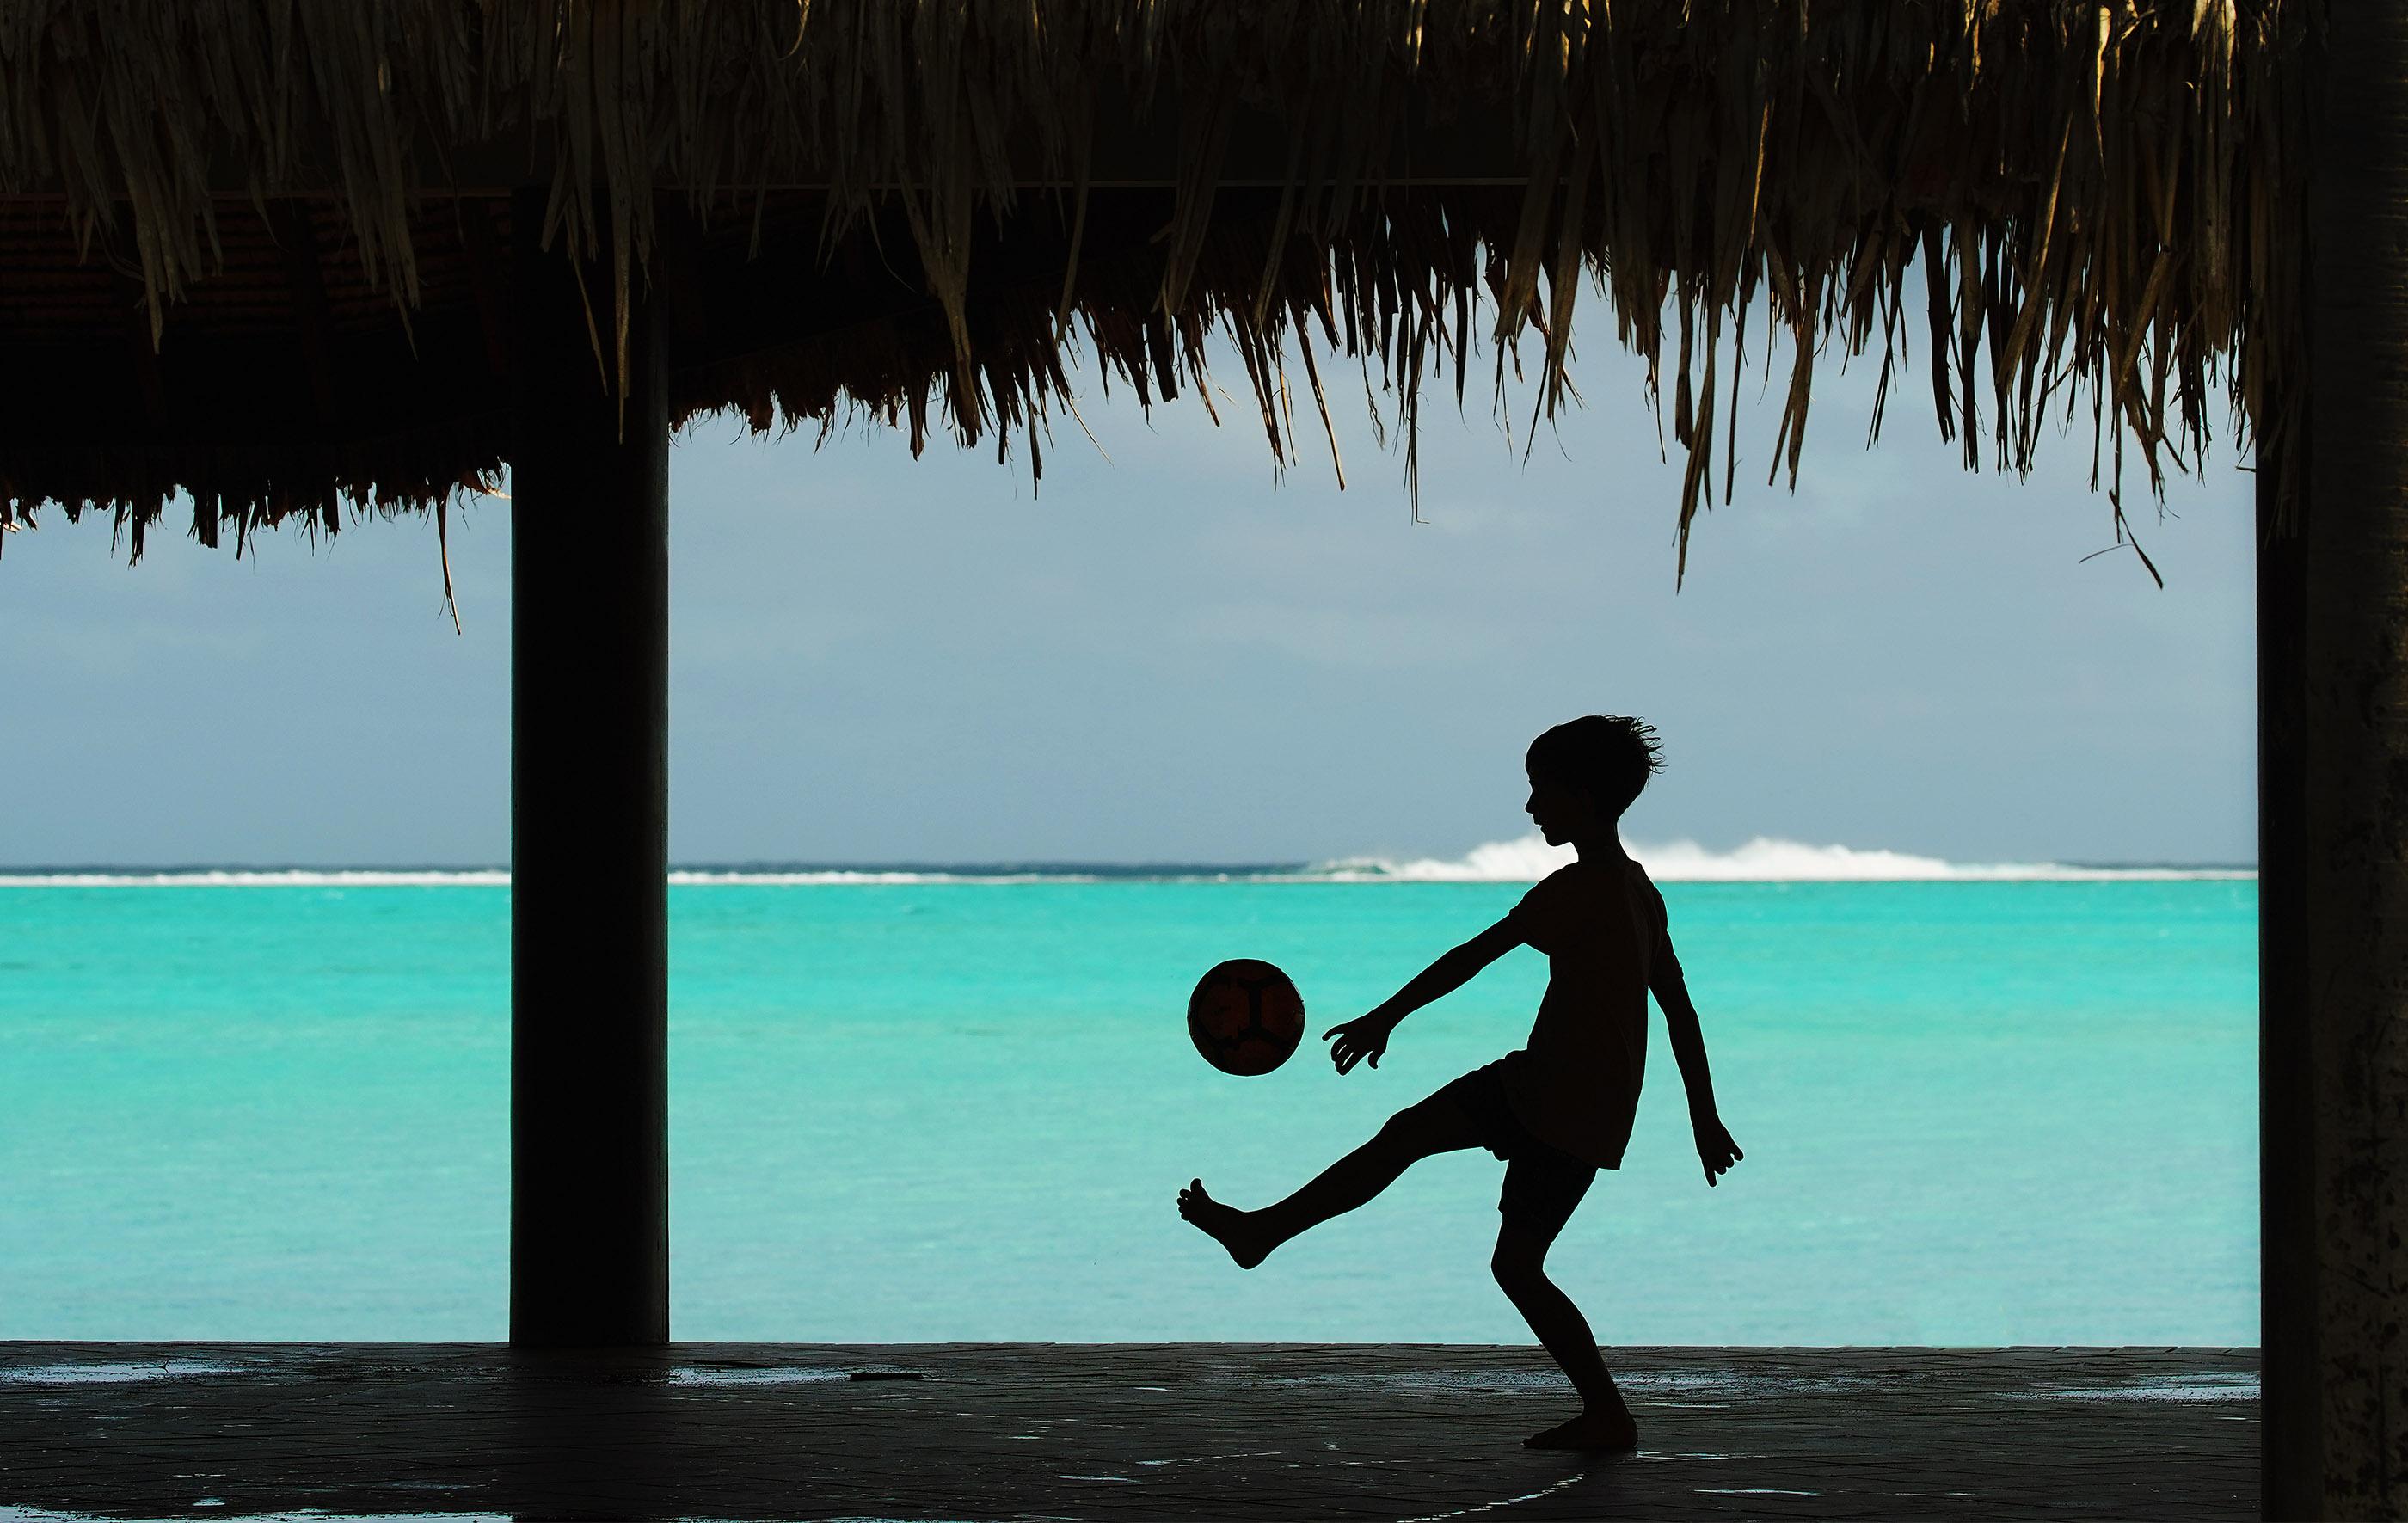 A boy plays with a soccer ball near the beach in Bora Bora on May 27, 2019.